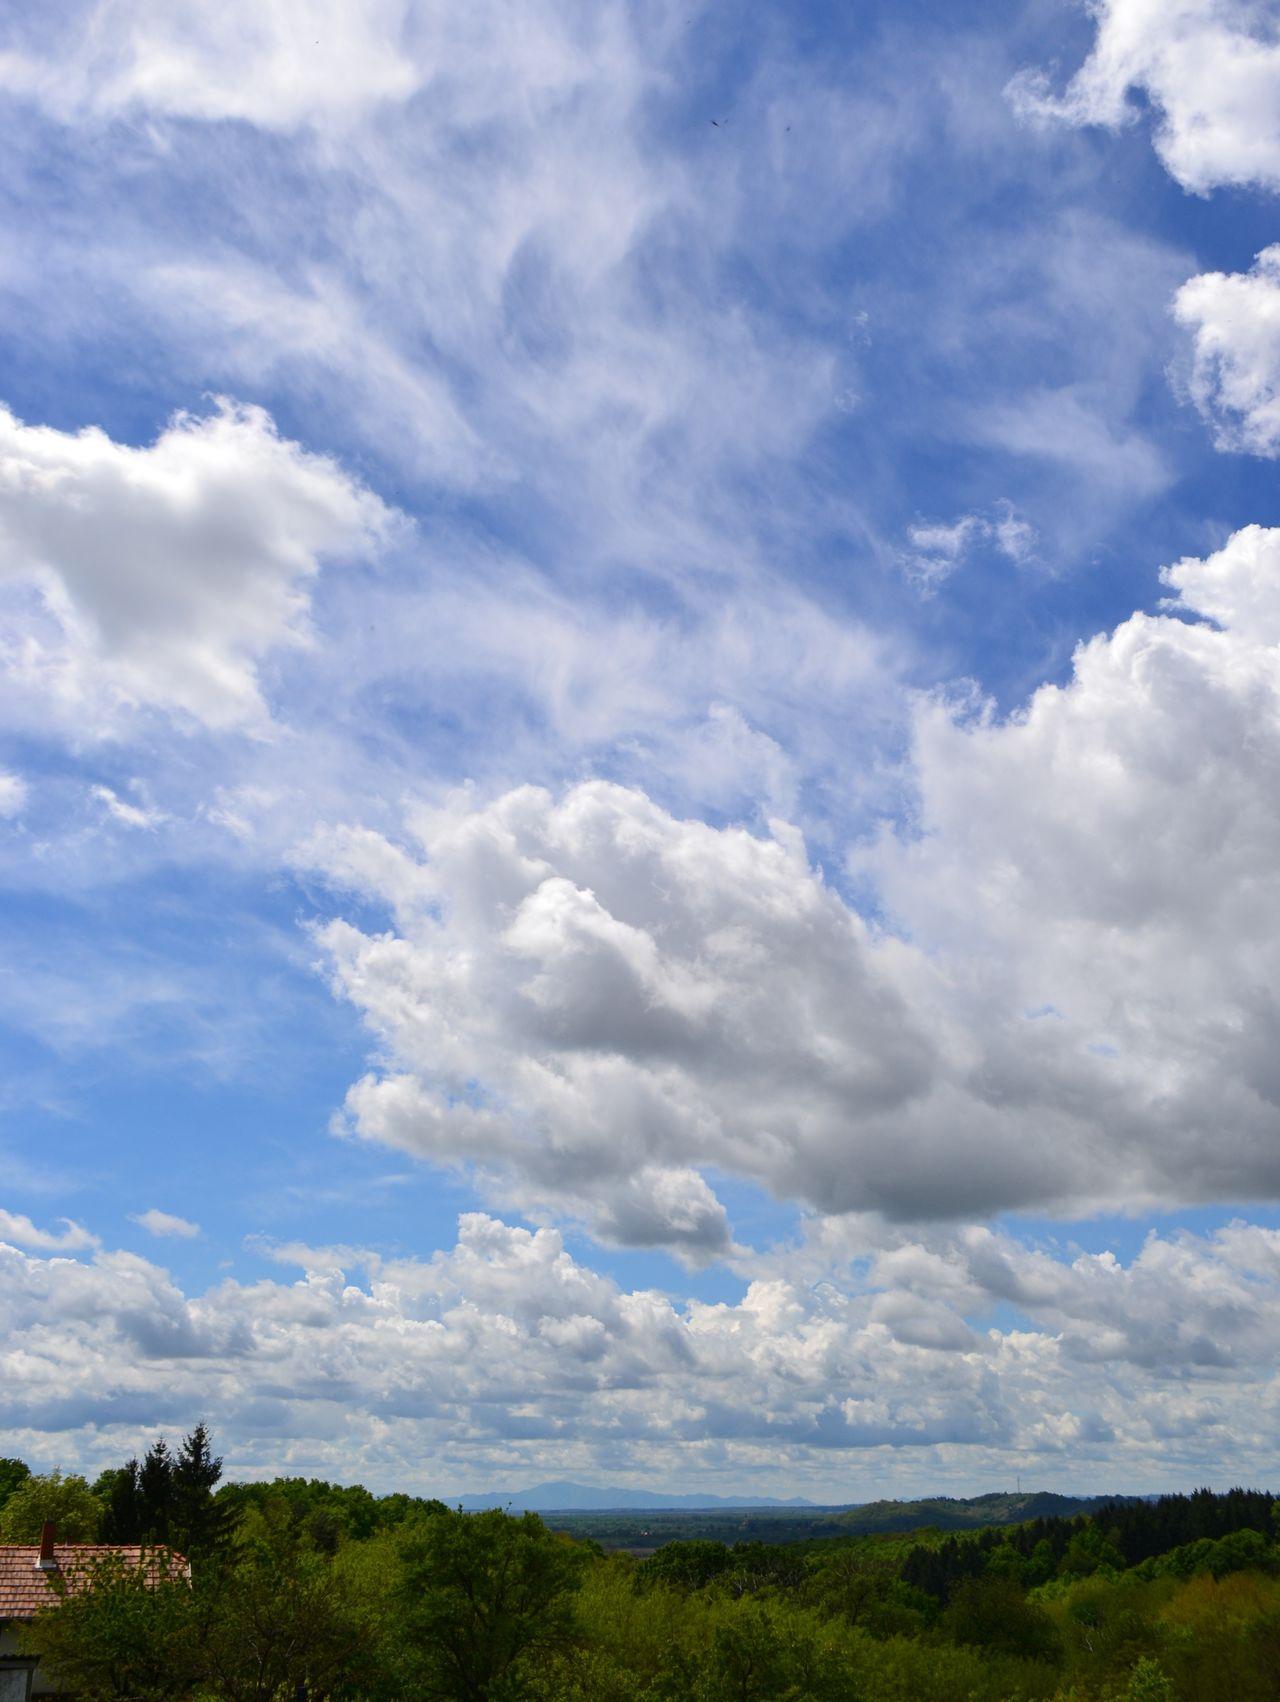 Cloud Cloud - Sky Cloudscape Cloudy Distant Home Moody Sky My Little Hiding Place Outdoors Sky